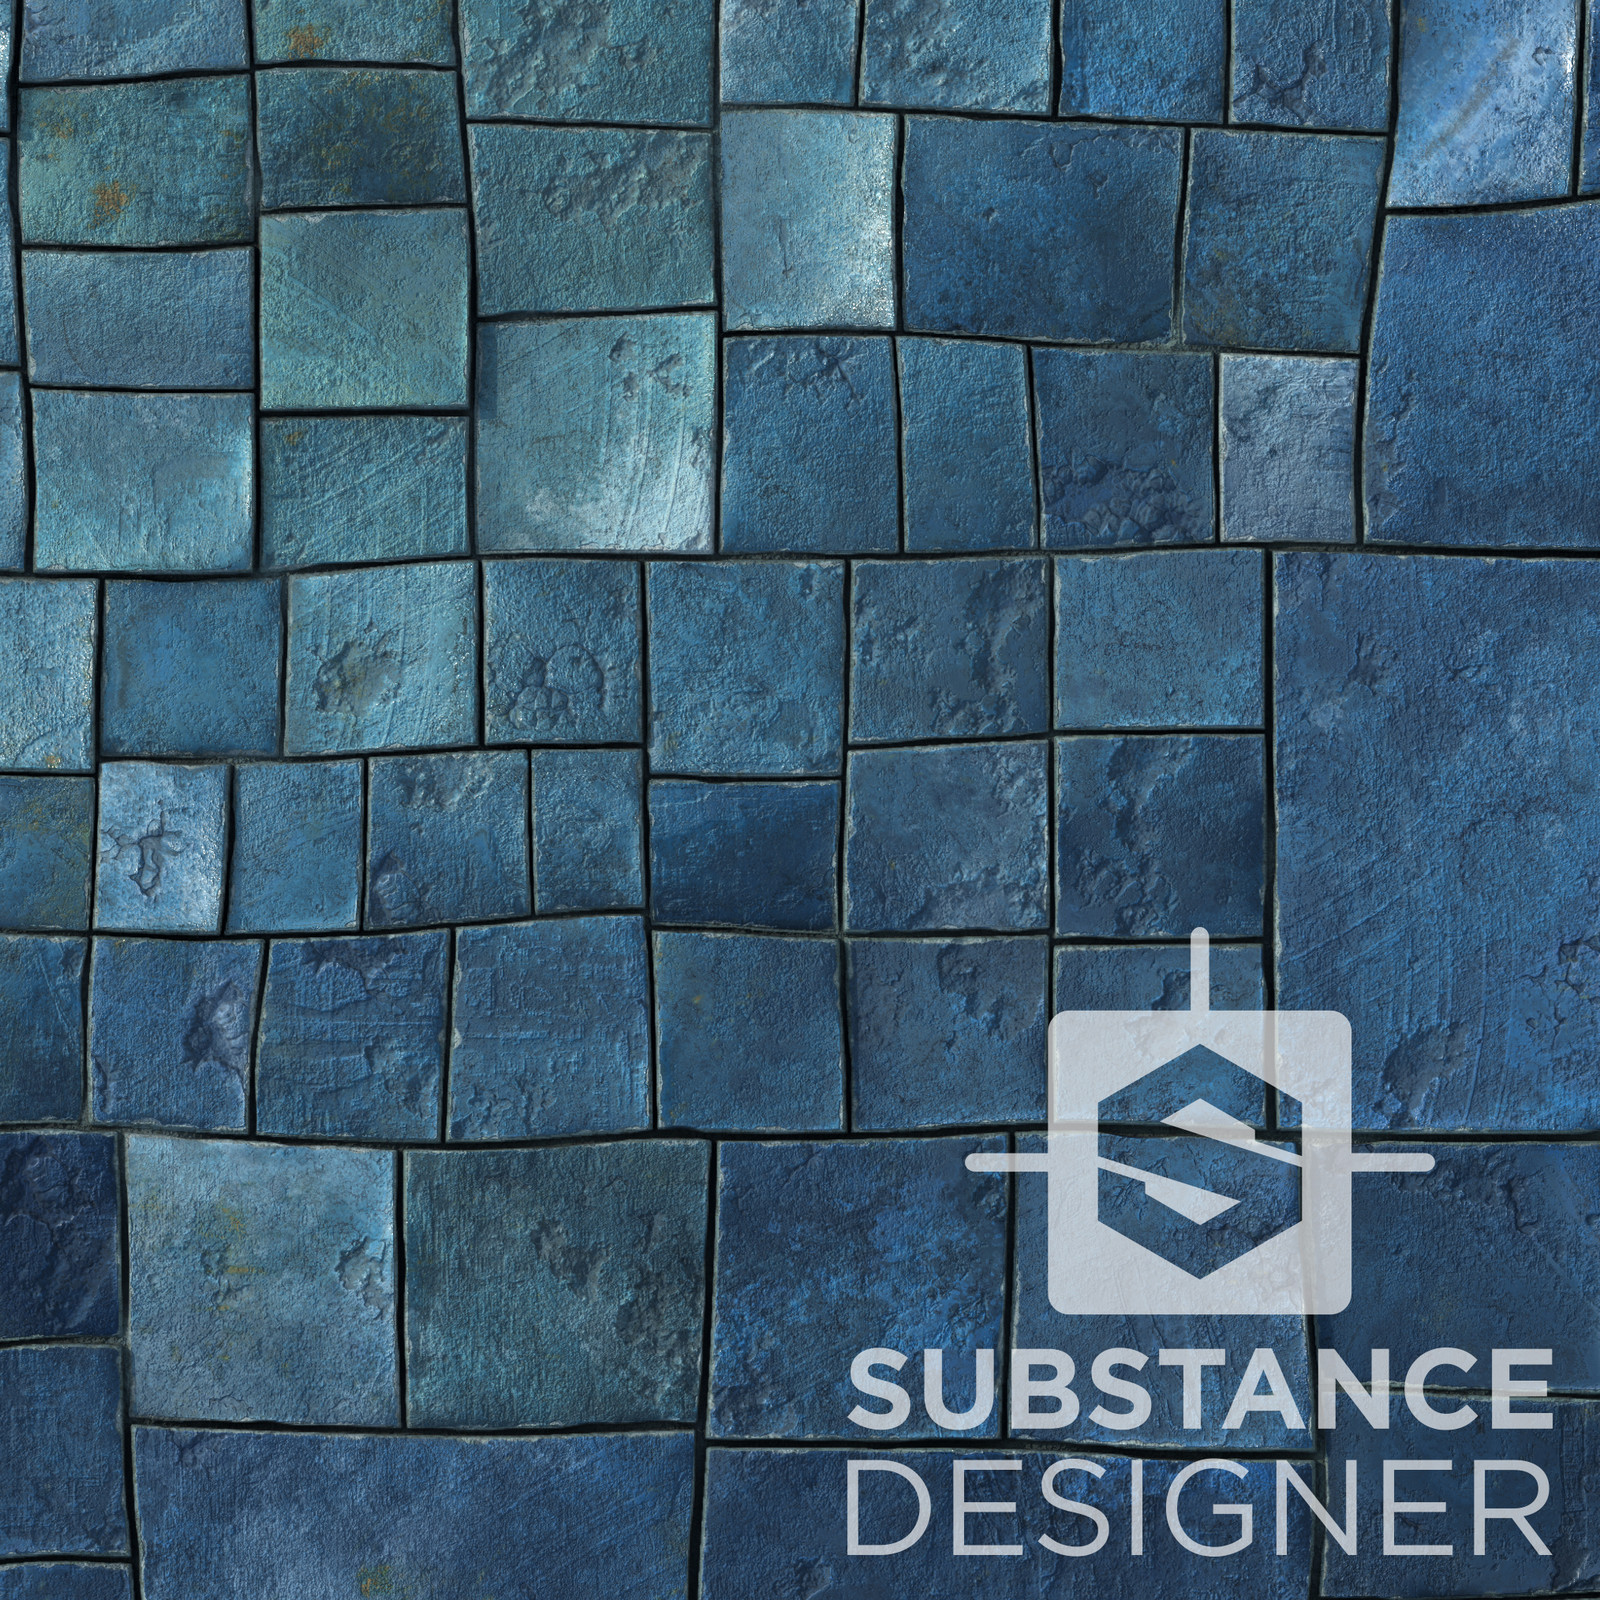 Random Stuff 02 - 100% procedural, Substance Designer